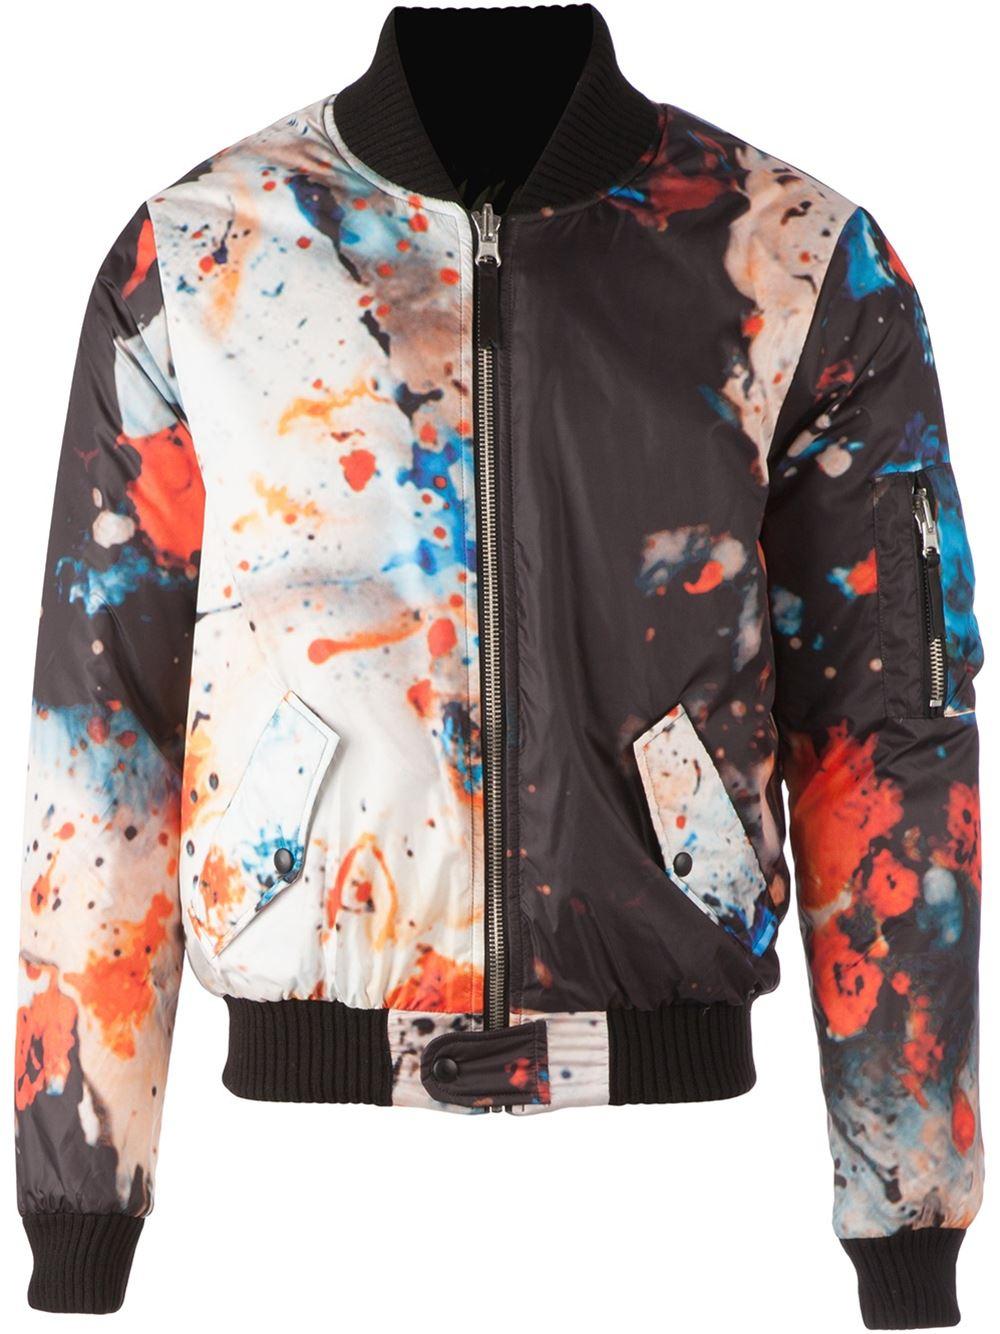 Mens jacket half - Gallery